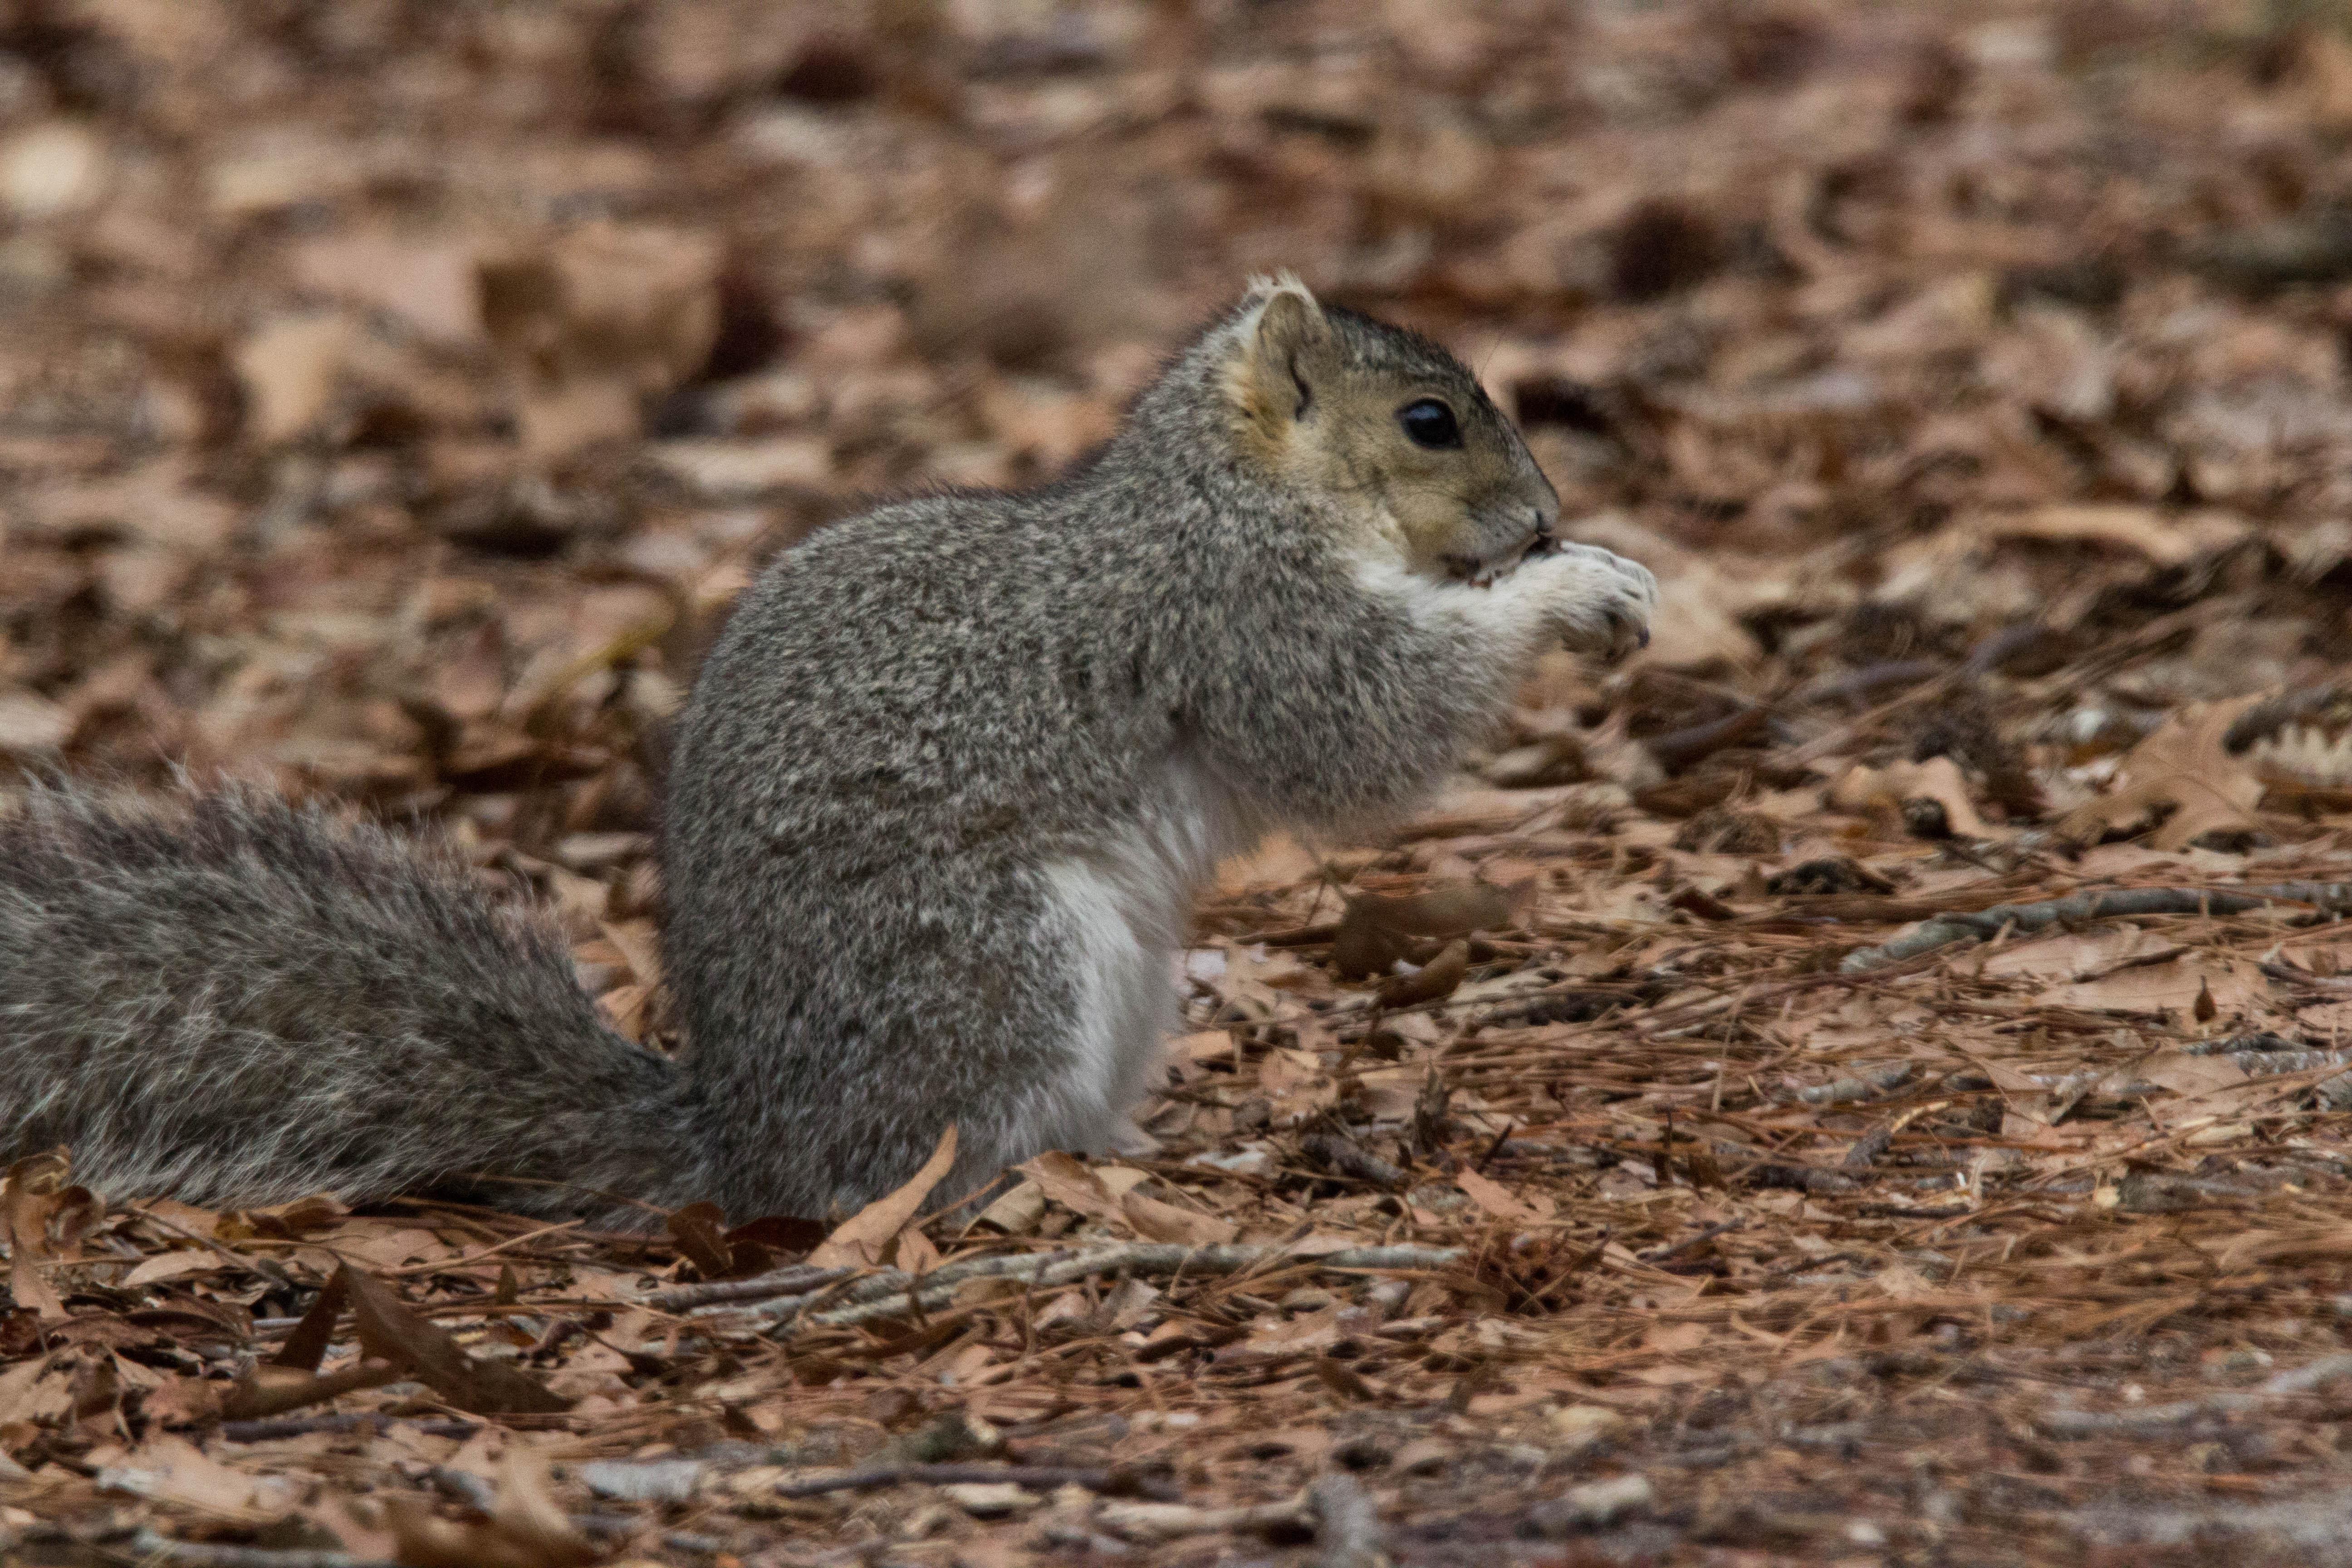 Delmarva peninsula fox squirrel at Blackwater National Wildlife refuge